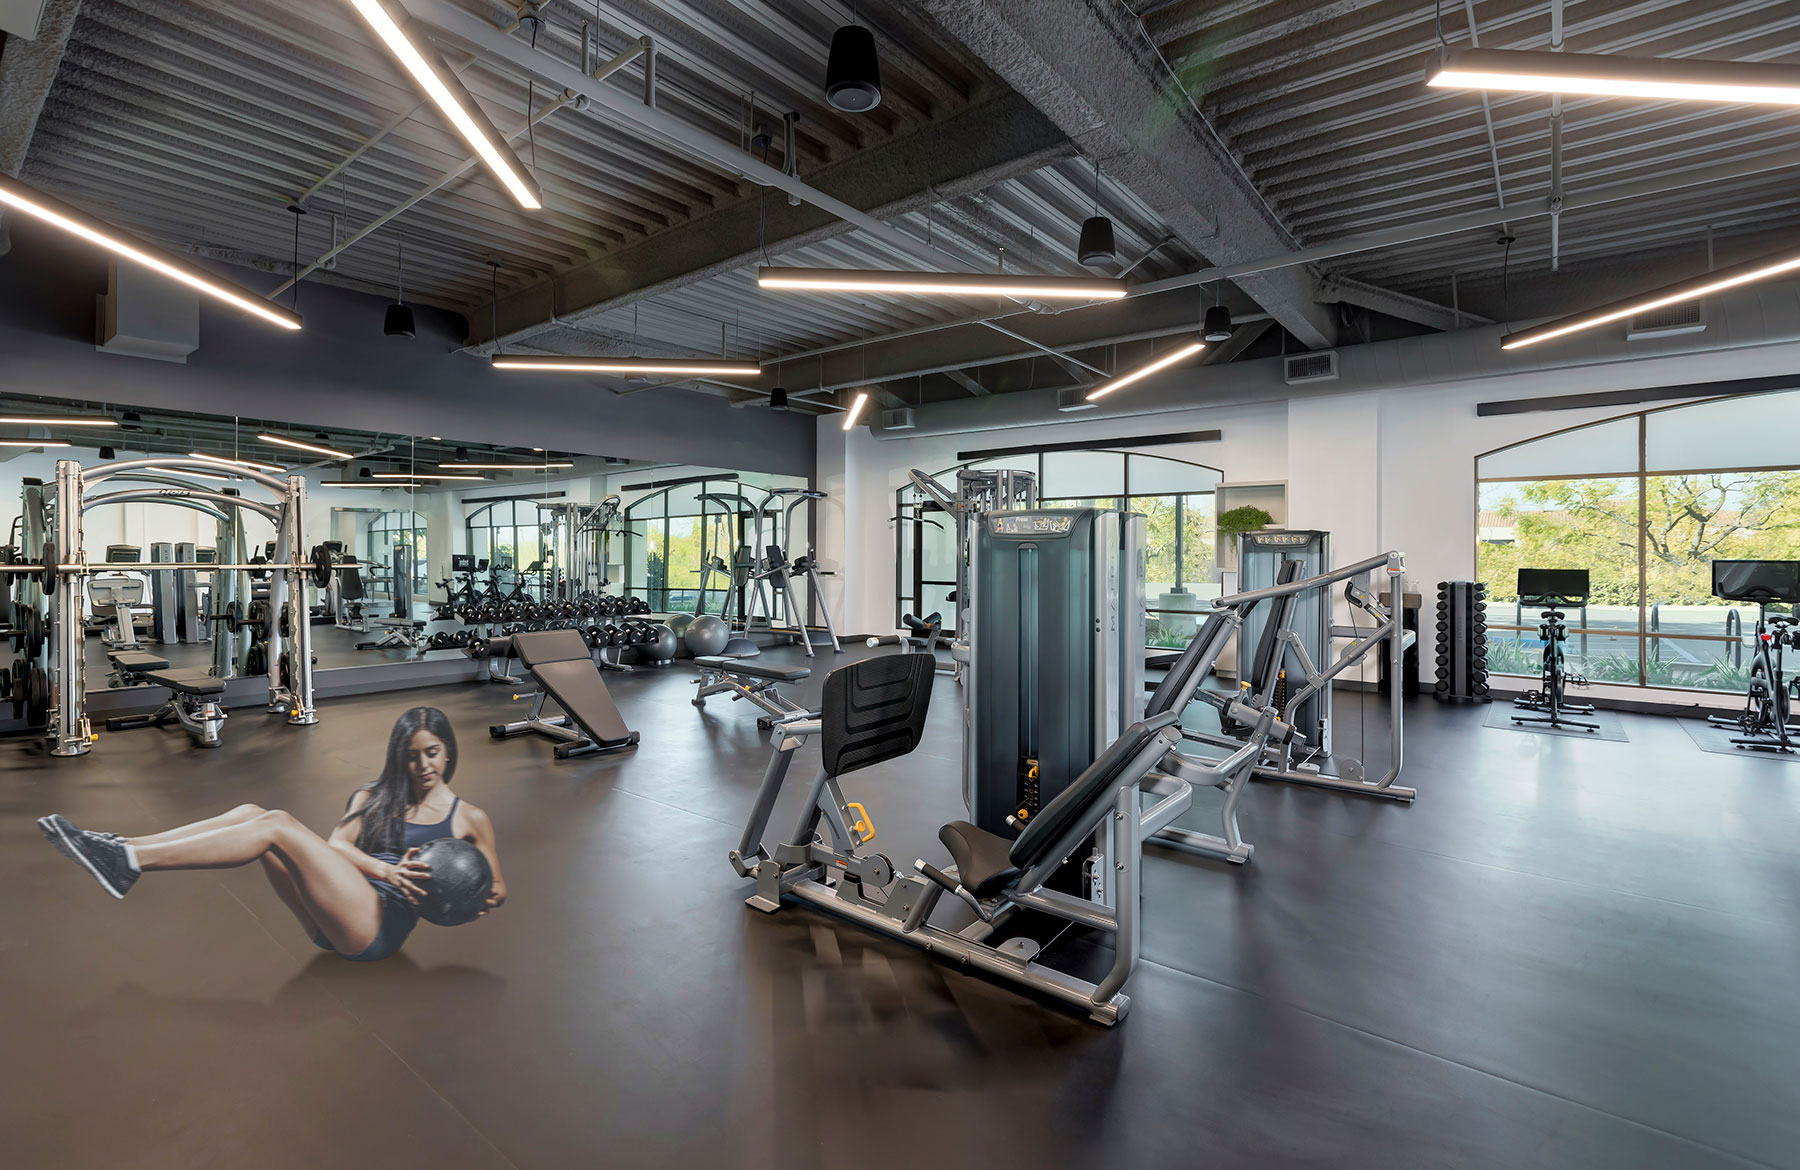 Calabasas Park Center Building Fitness